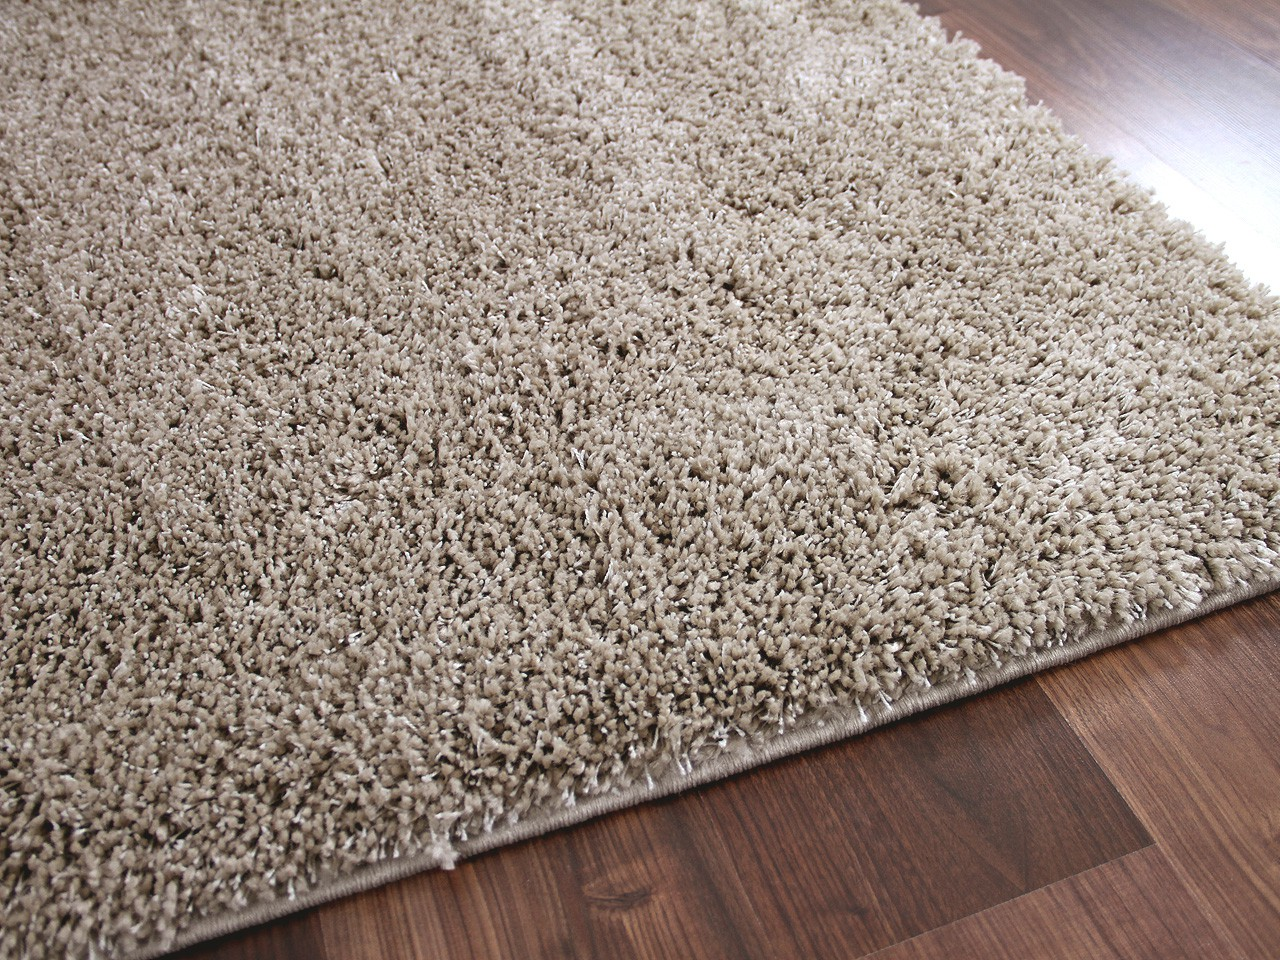 hochflor shaggy teppich dream natur abverkauf teppiche hochflor langflor teppiche beige und. Black Bedroom Furniture Sets. Home Design Ideas